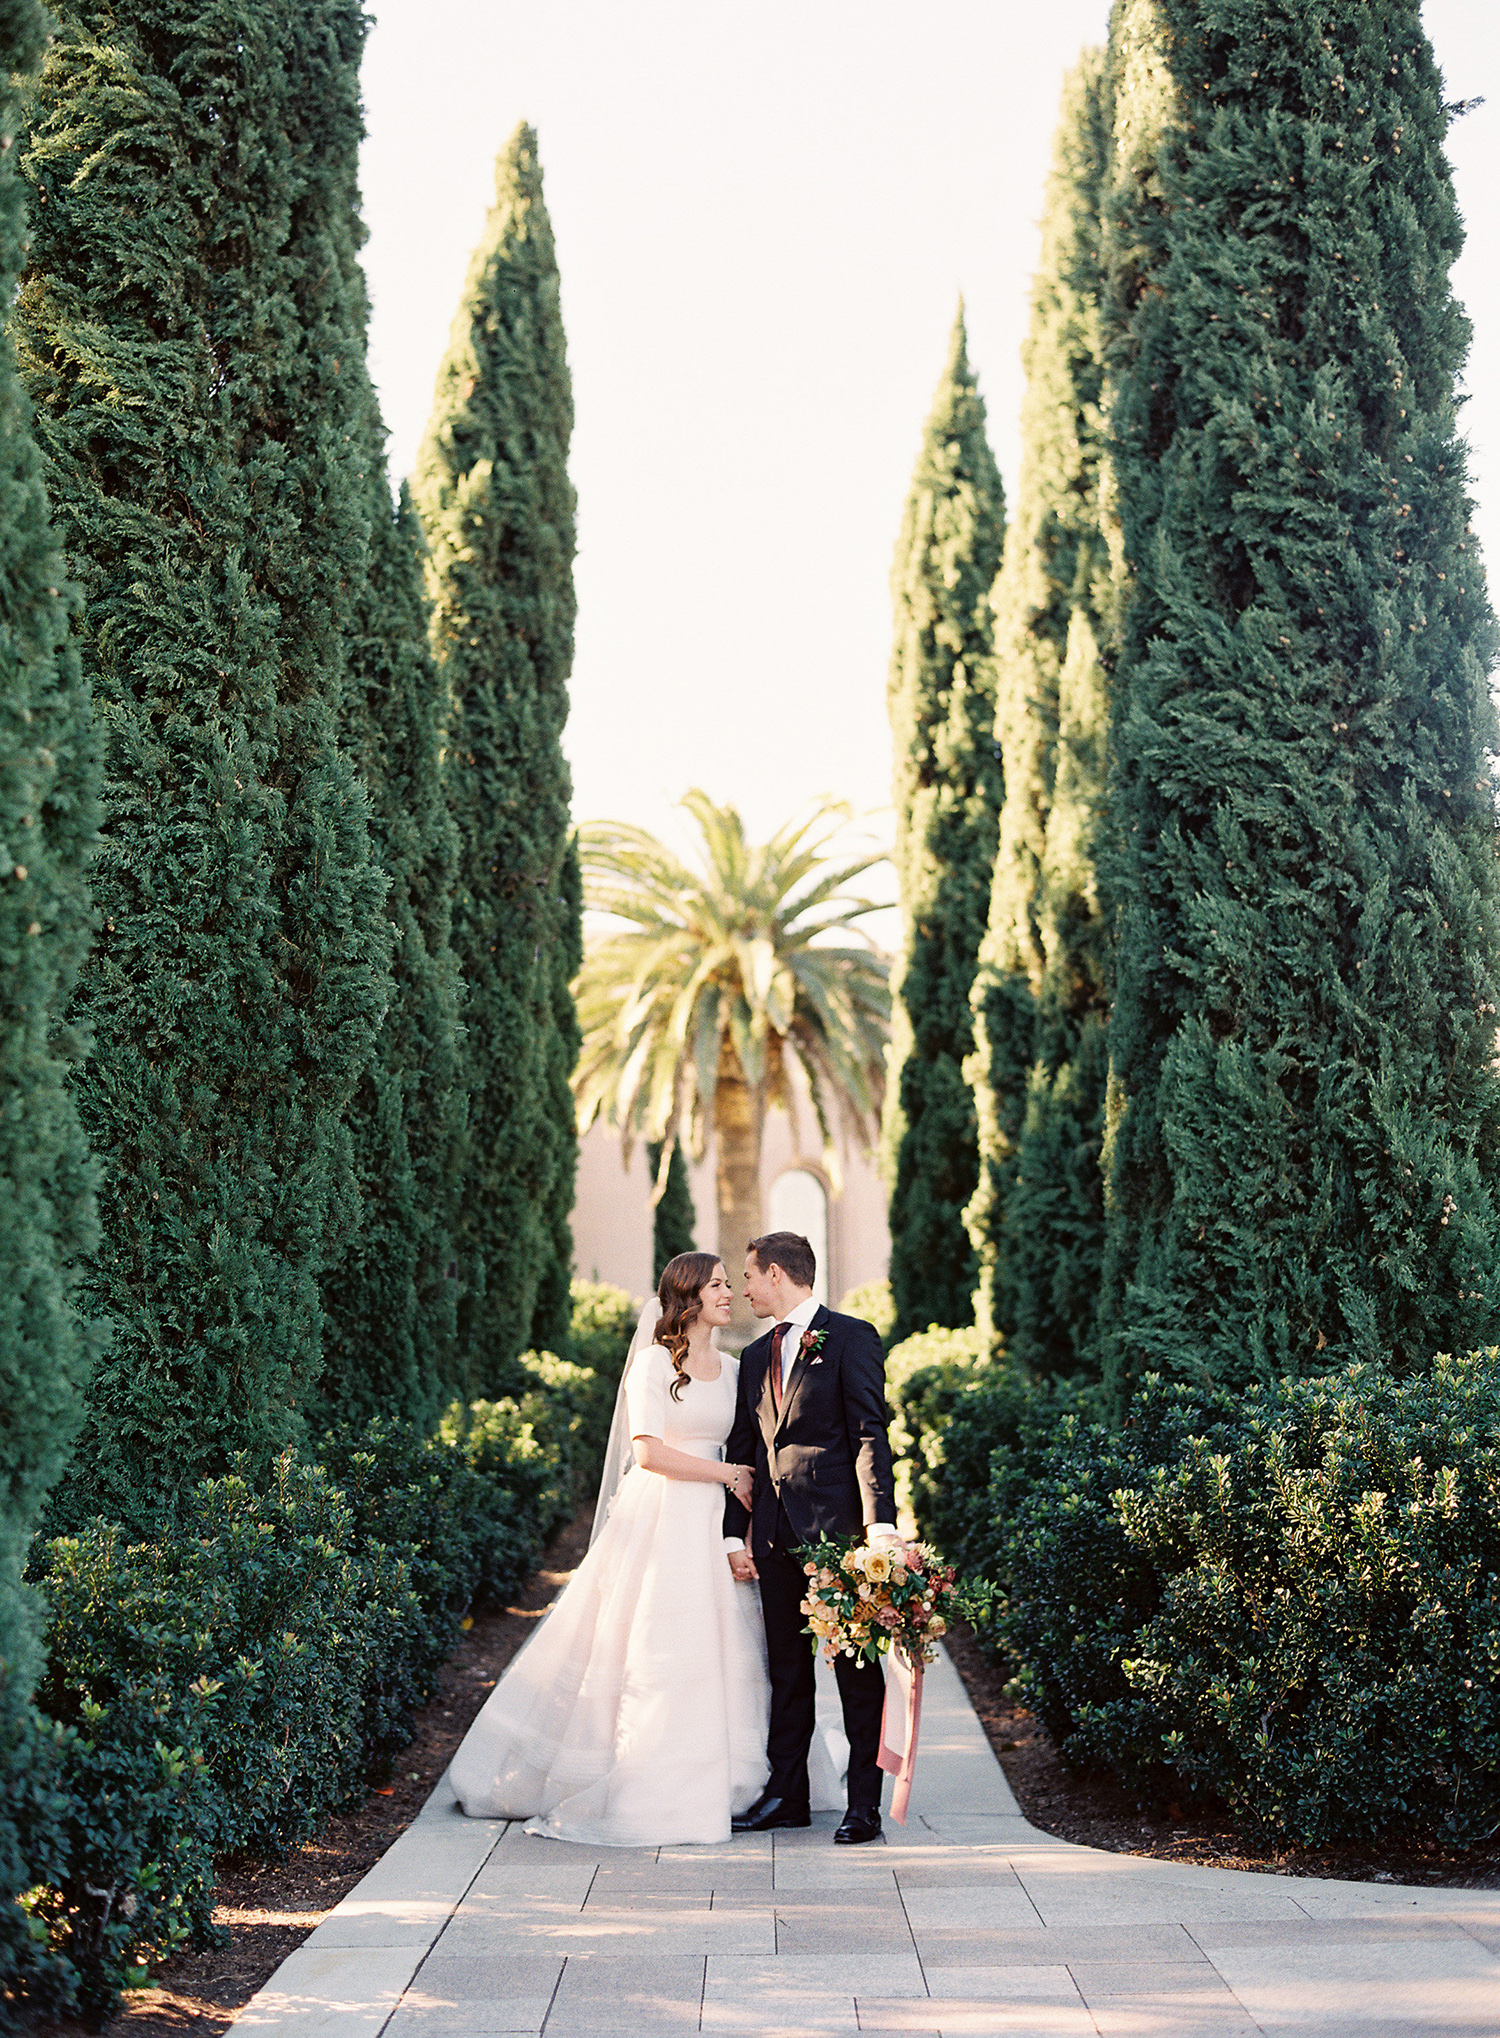 brooke dalton wedding couple between hedges